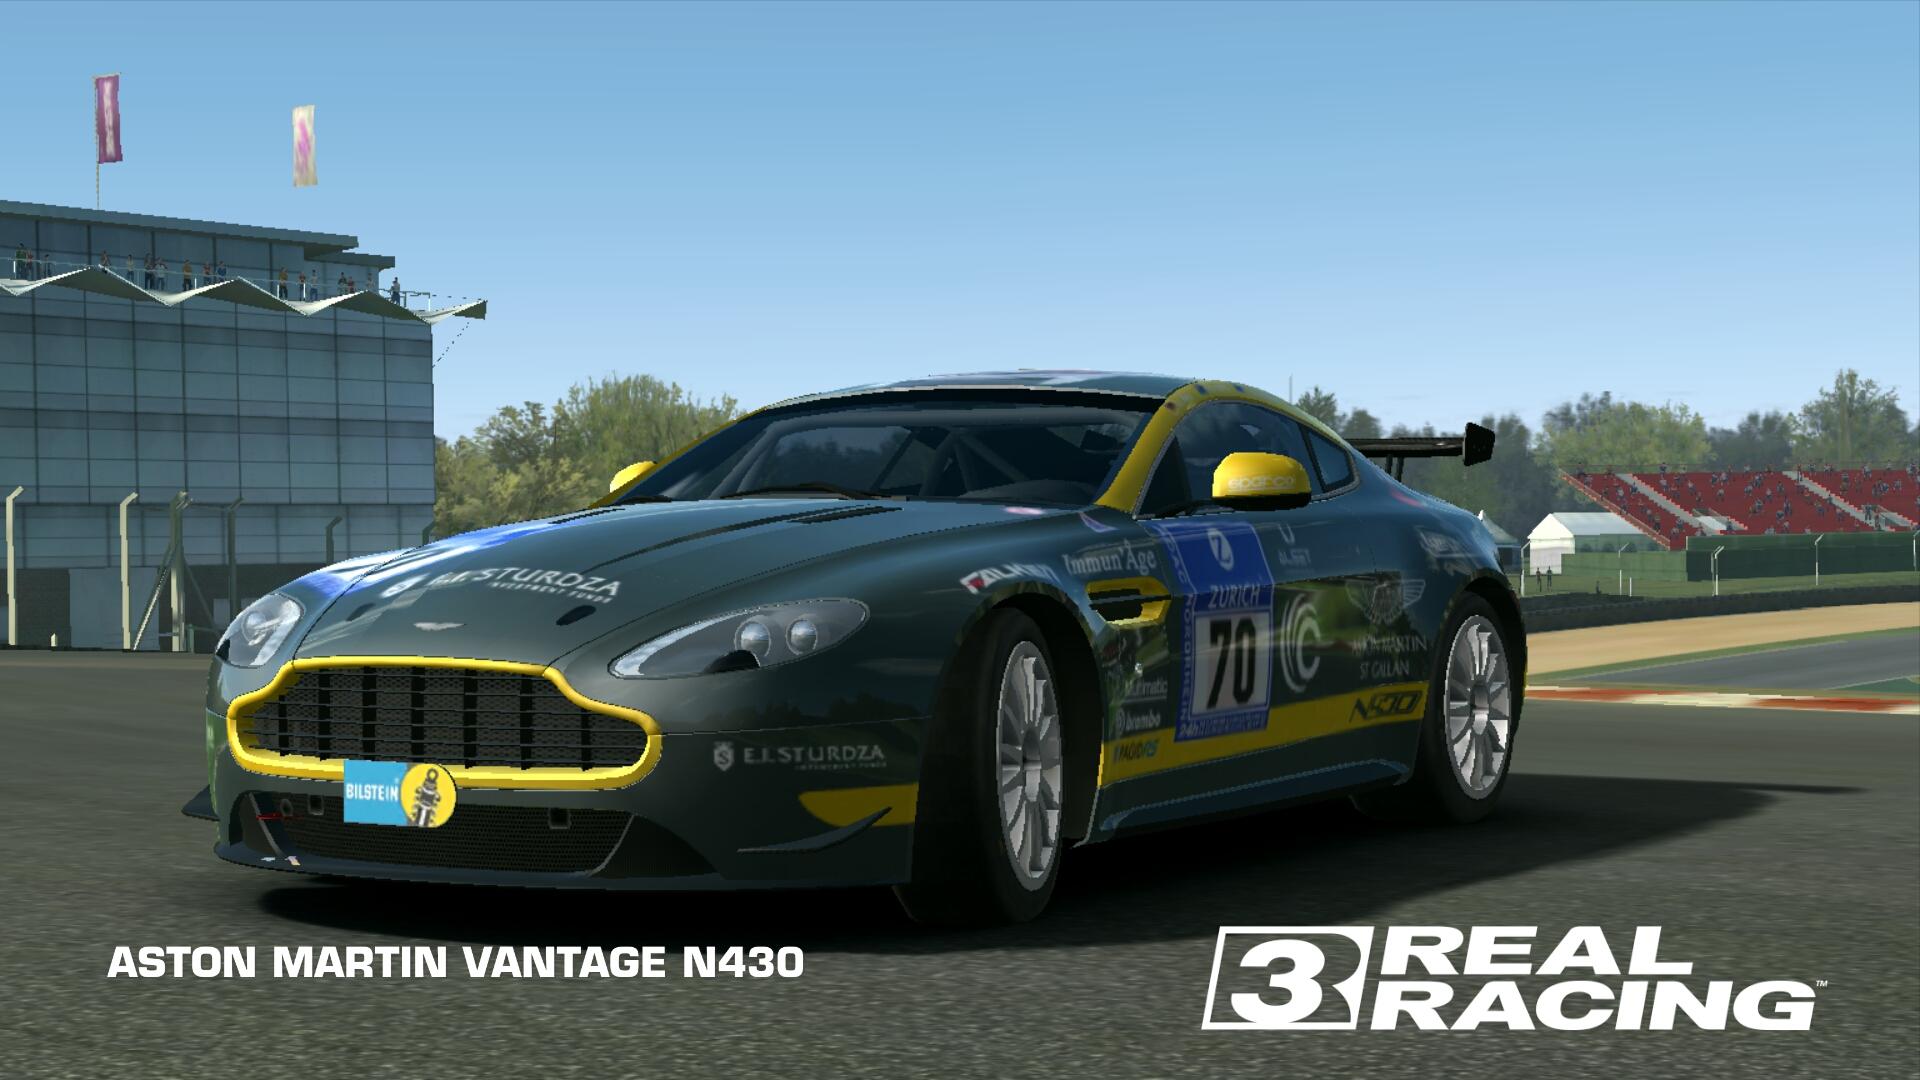 ASTON MARTIN VANTAGE N430   Real Racing 3 Wiki   FANDOM powered by Wikia